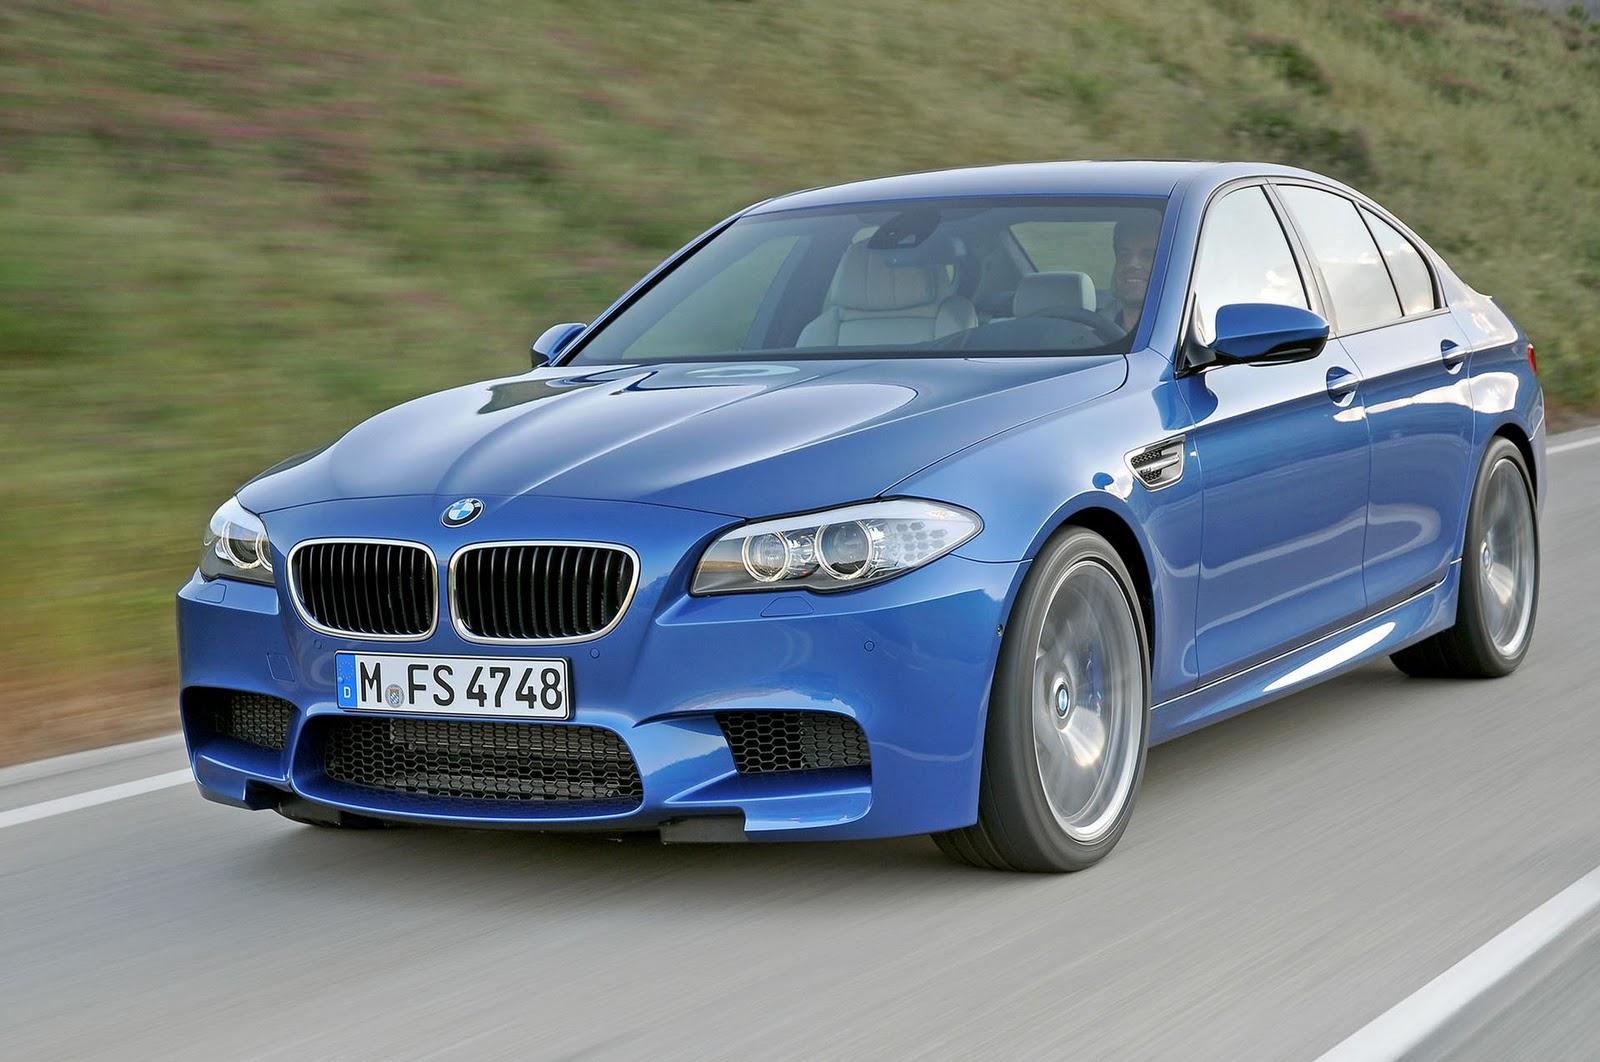 BMW M5 Series Blue-F10 Car Wallpaper 165 - Car Wallpaper